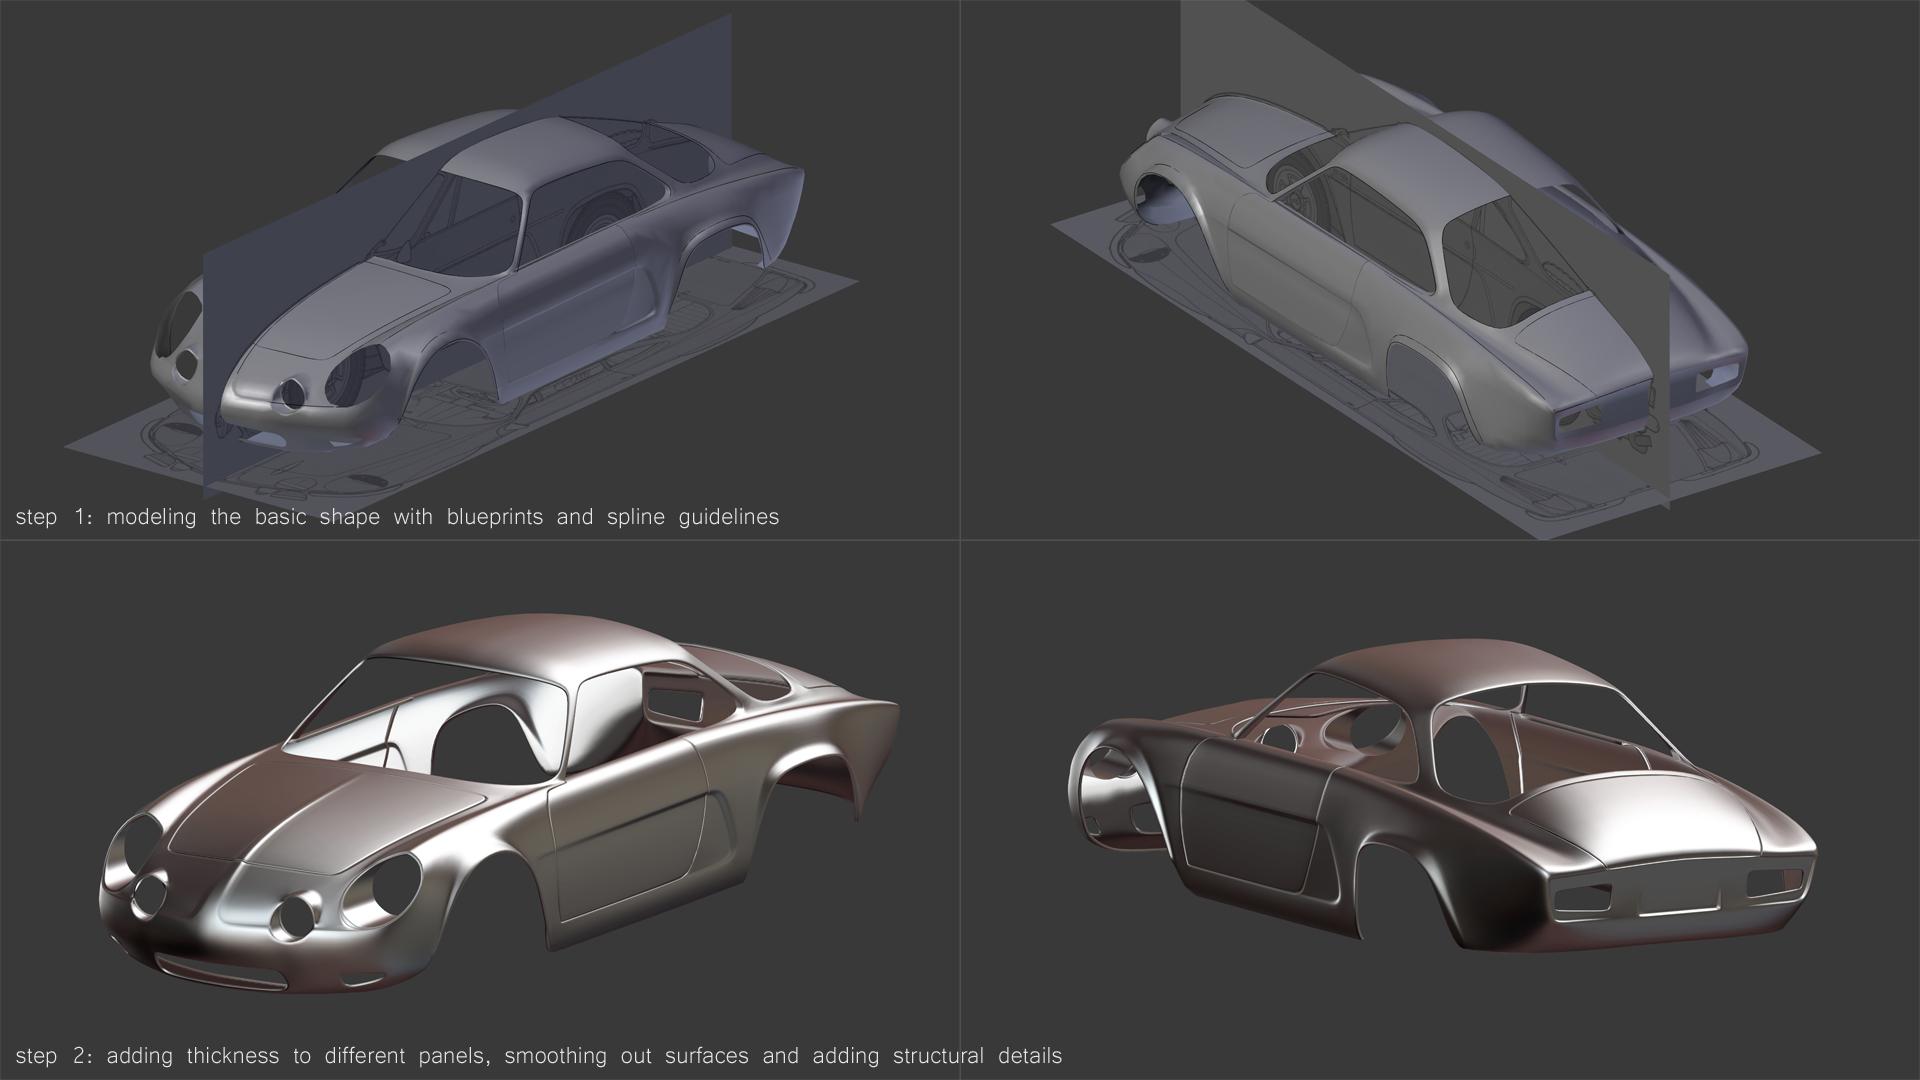 Modeling of Renault